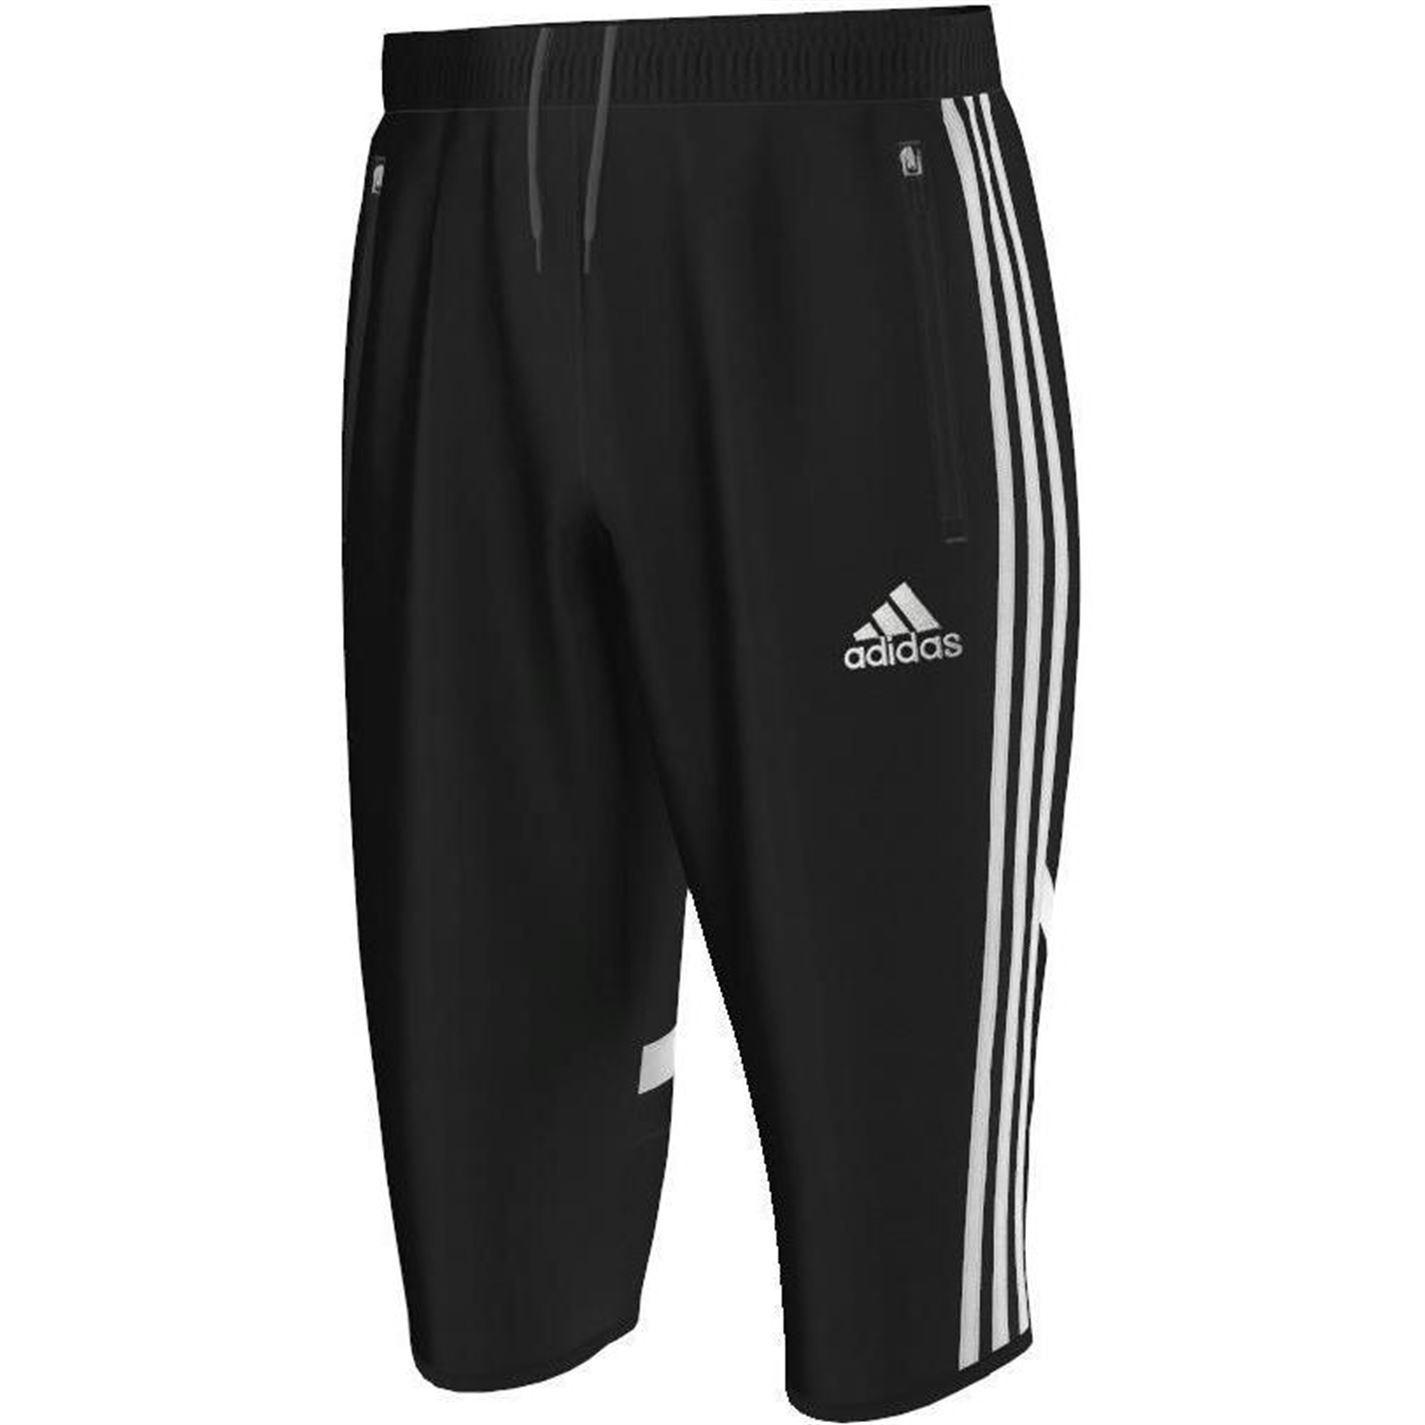 adidas mens con14 three quarter pnt 3 4 football shorts pants bottoms ebay. Black Bedroom Furniture Sets. Home Design Ideas